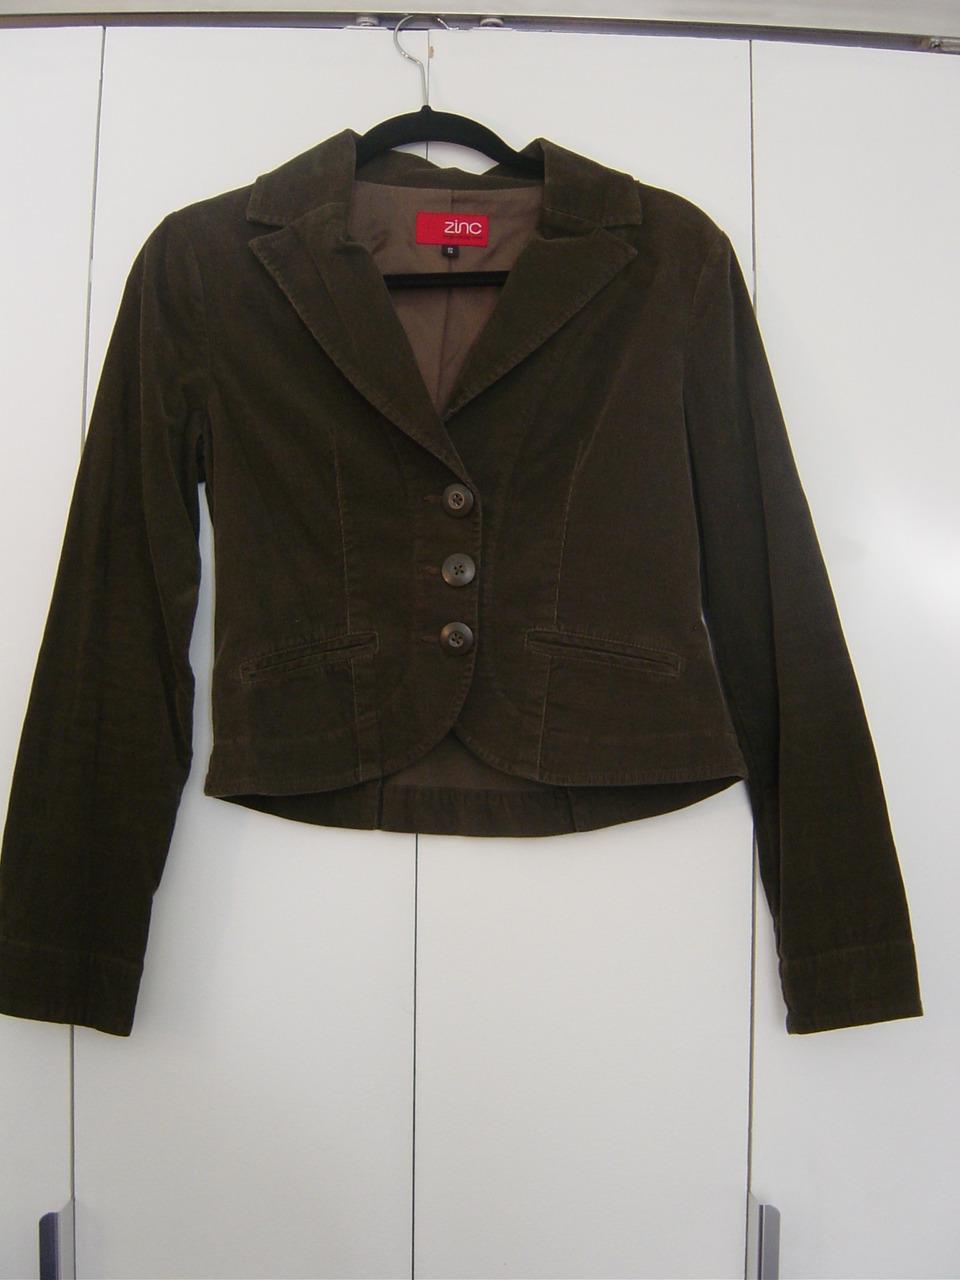 Zinc Jacket in Dark Green (Size: Small) EUC - $28.00